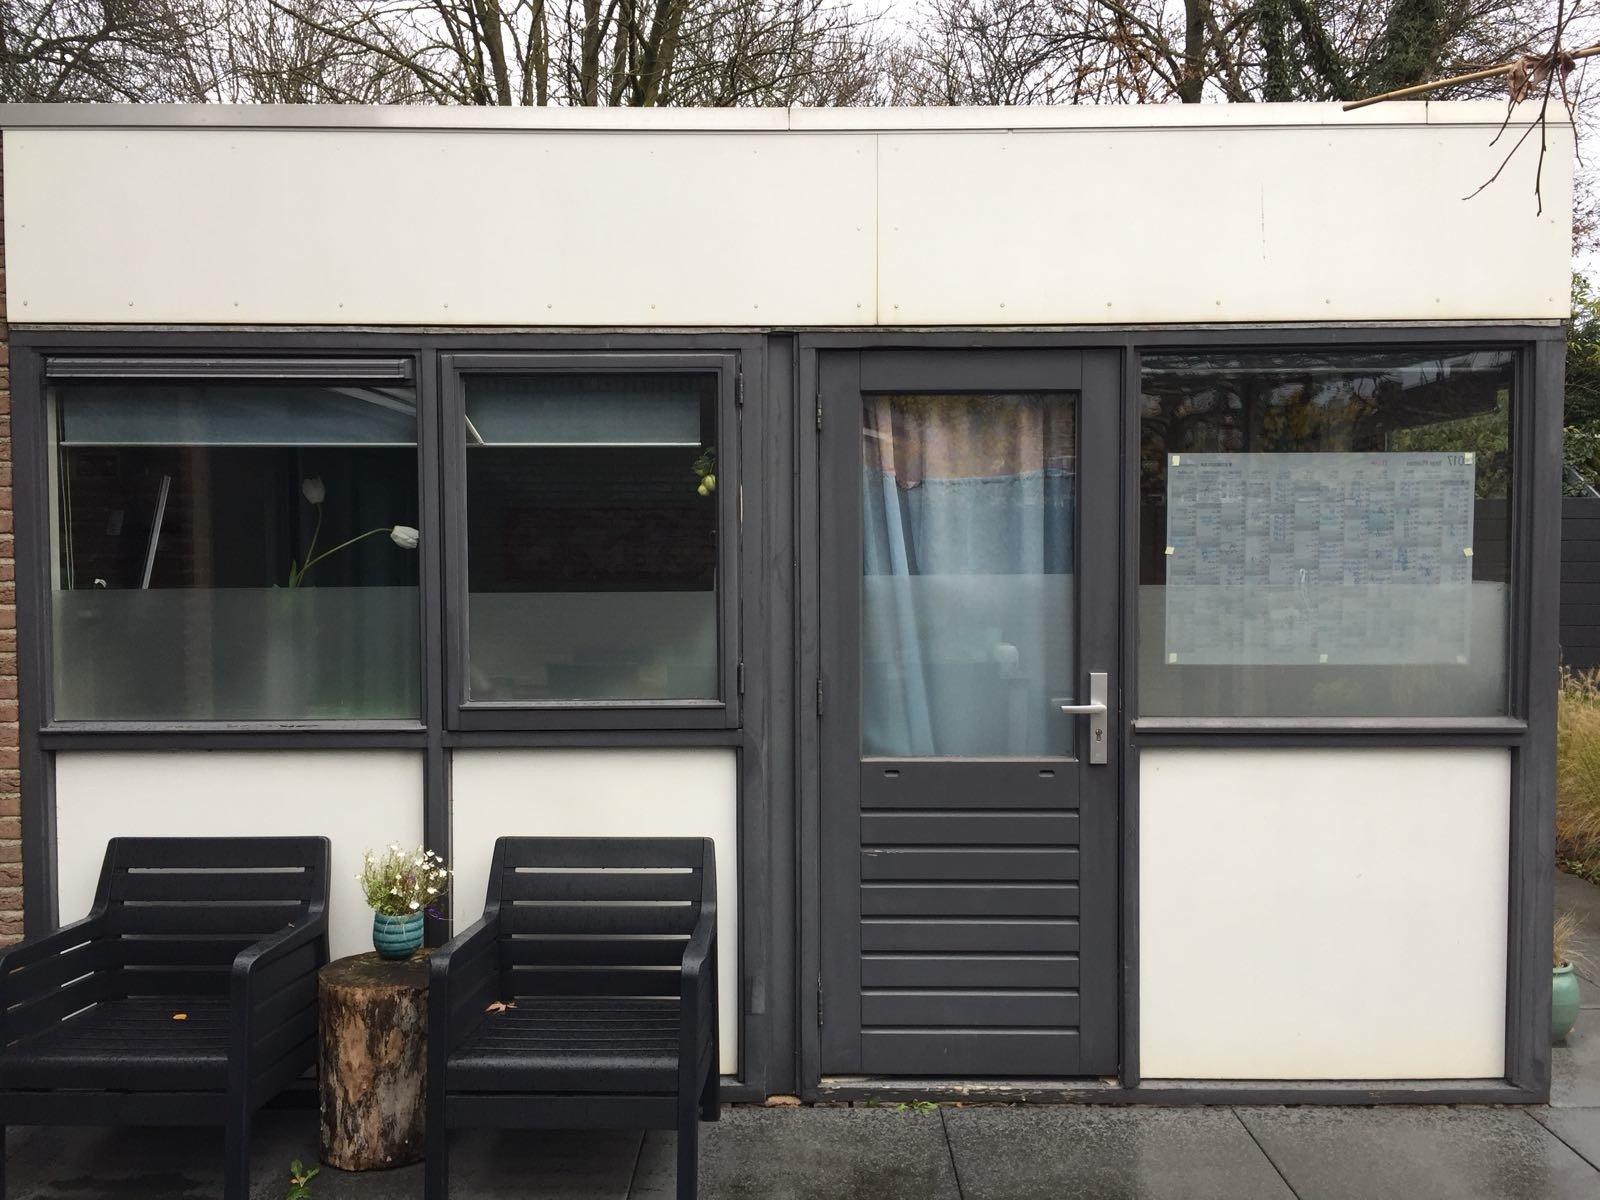 Verwonderend Verbouwing garage tot slaapkamer met badkamer - Werkspot TS-13